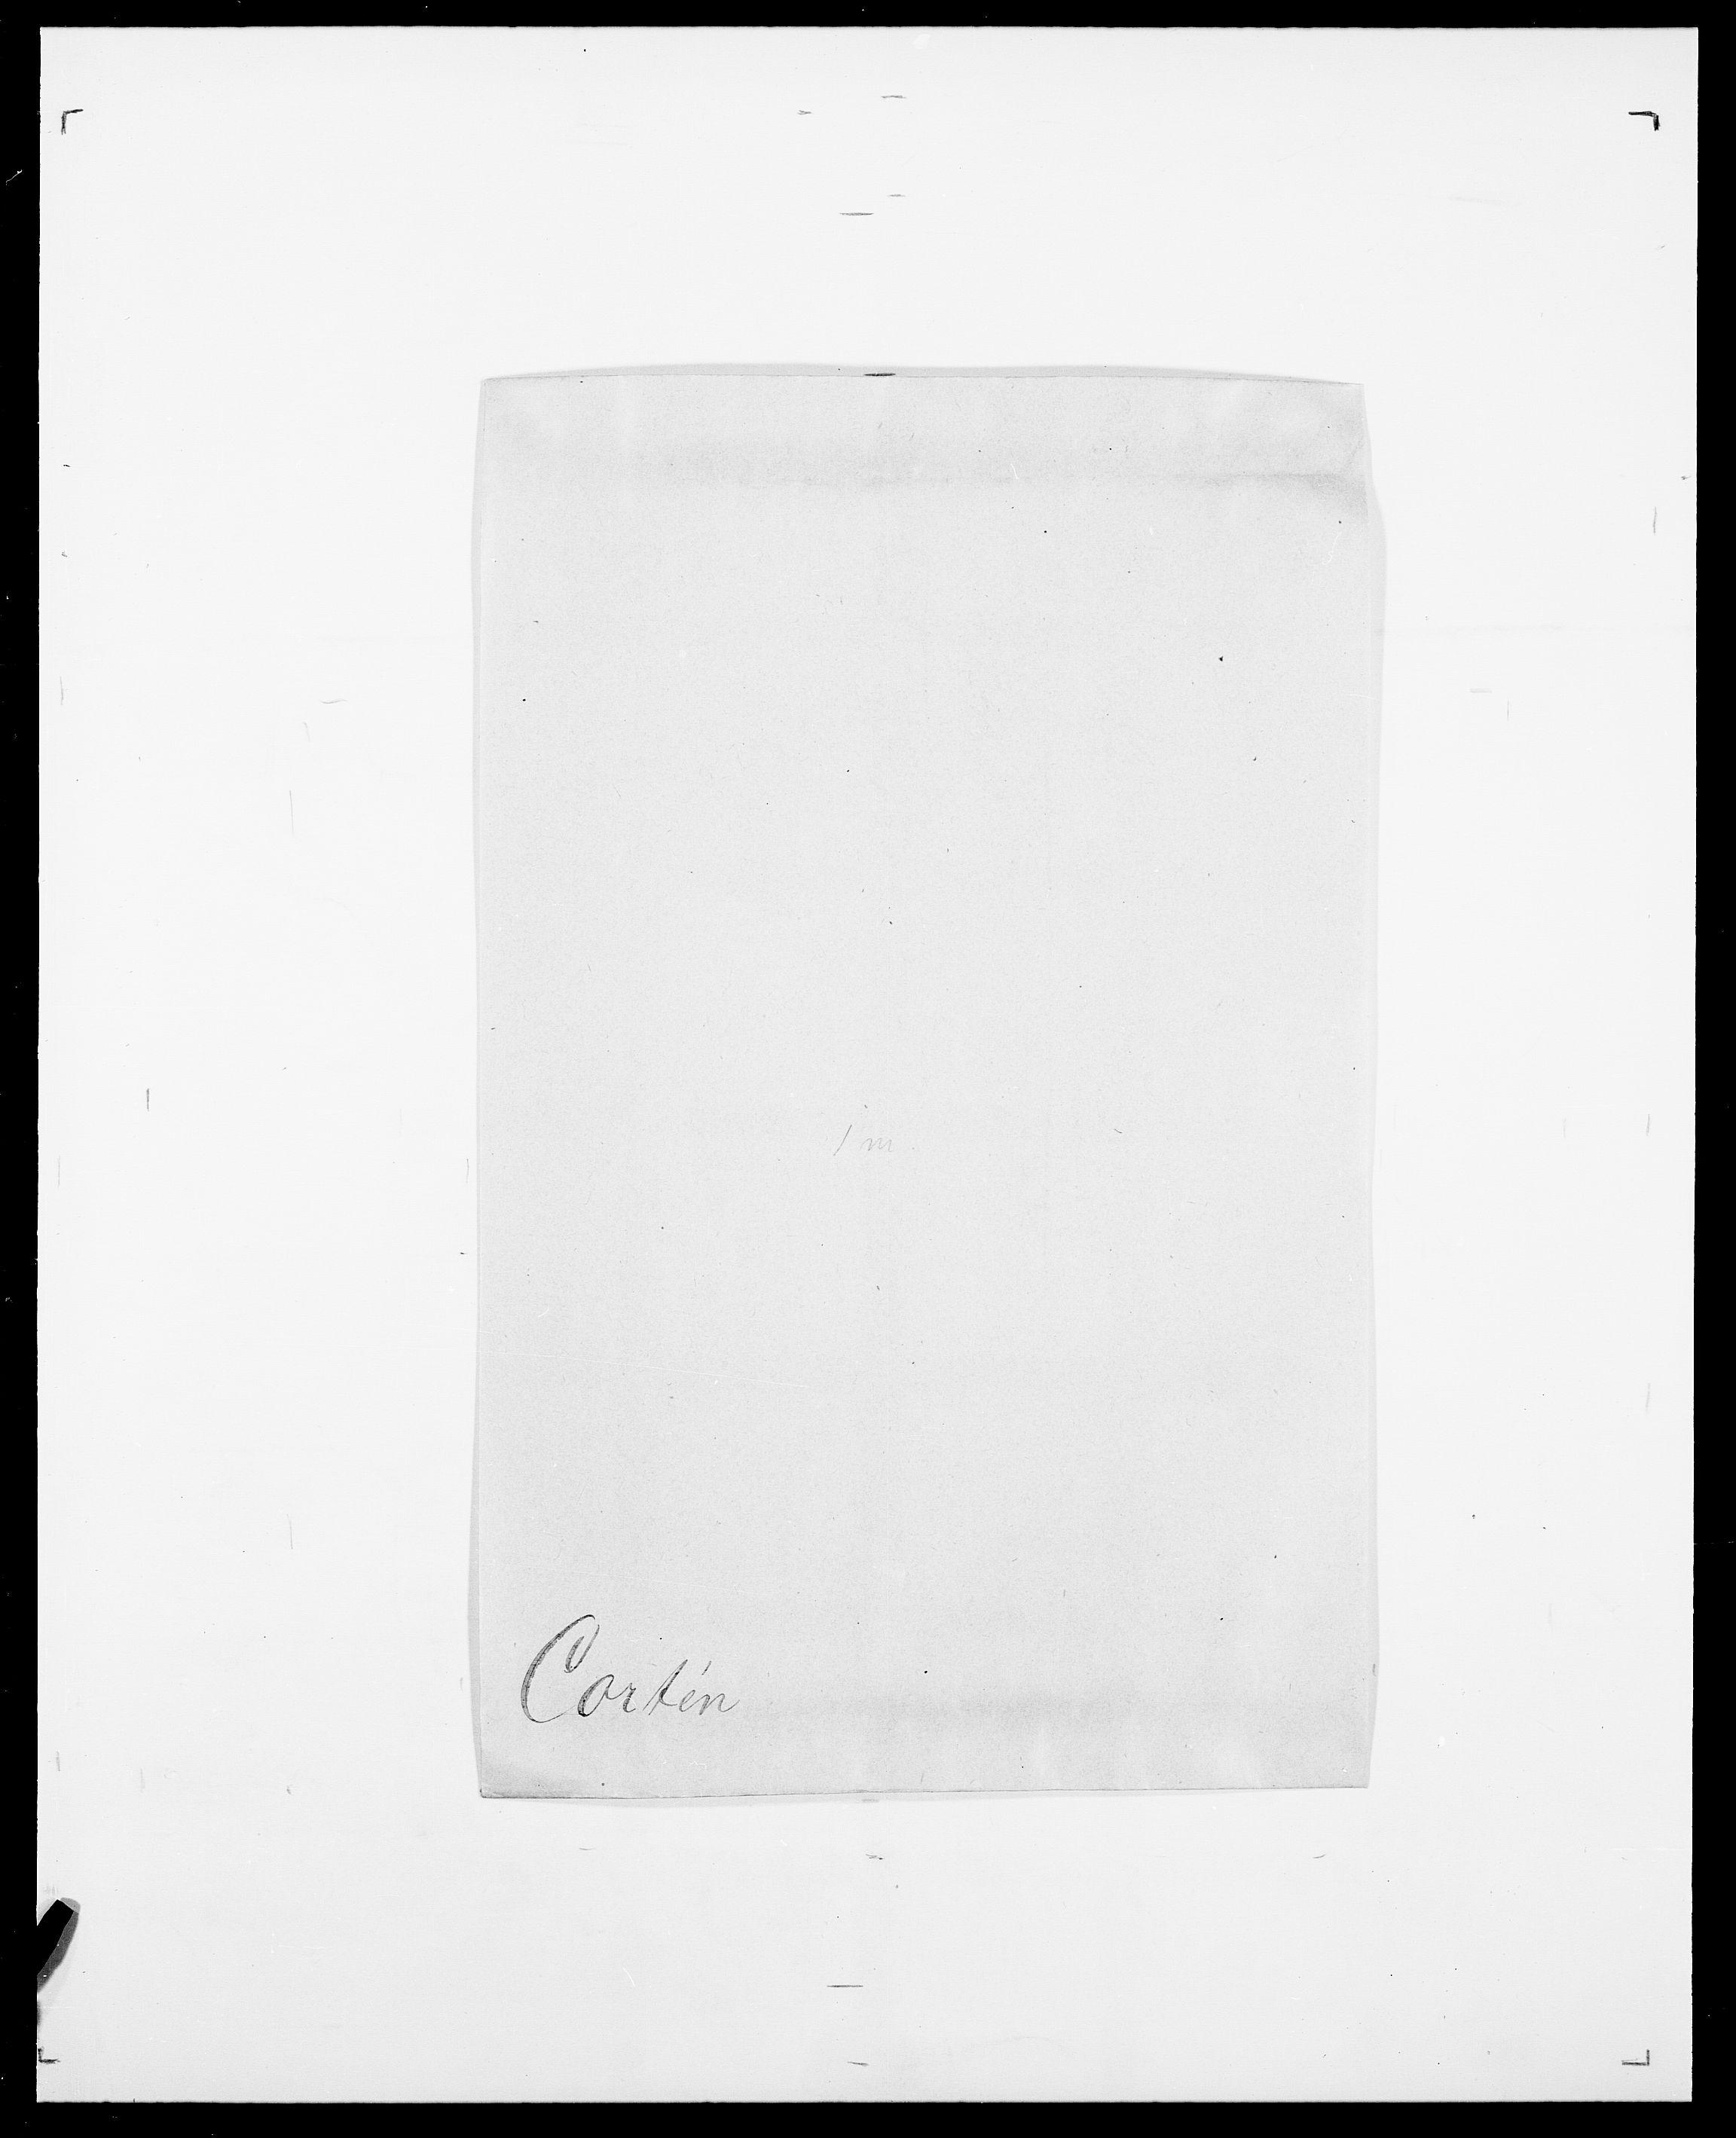 SAO, Delgobe, Charles Antoine - samling, D/Da/L0008: Capjon - Dagenbolt, s. 545